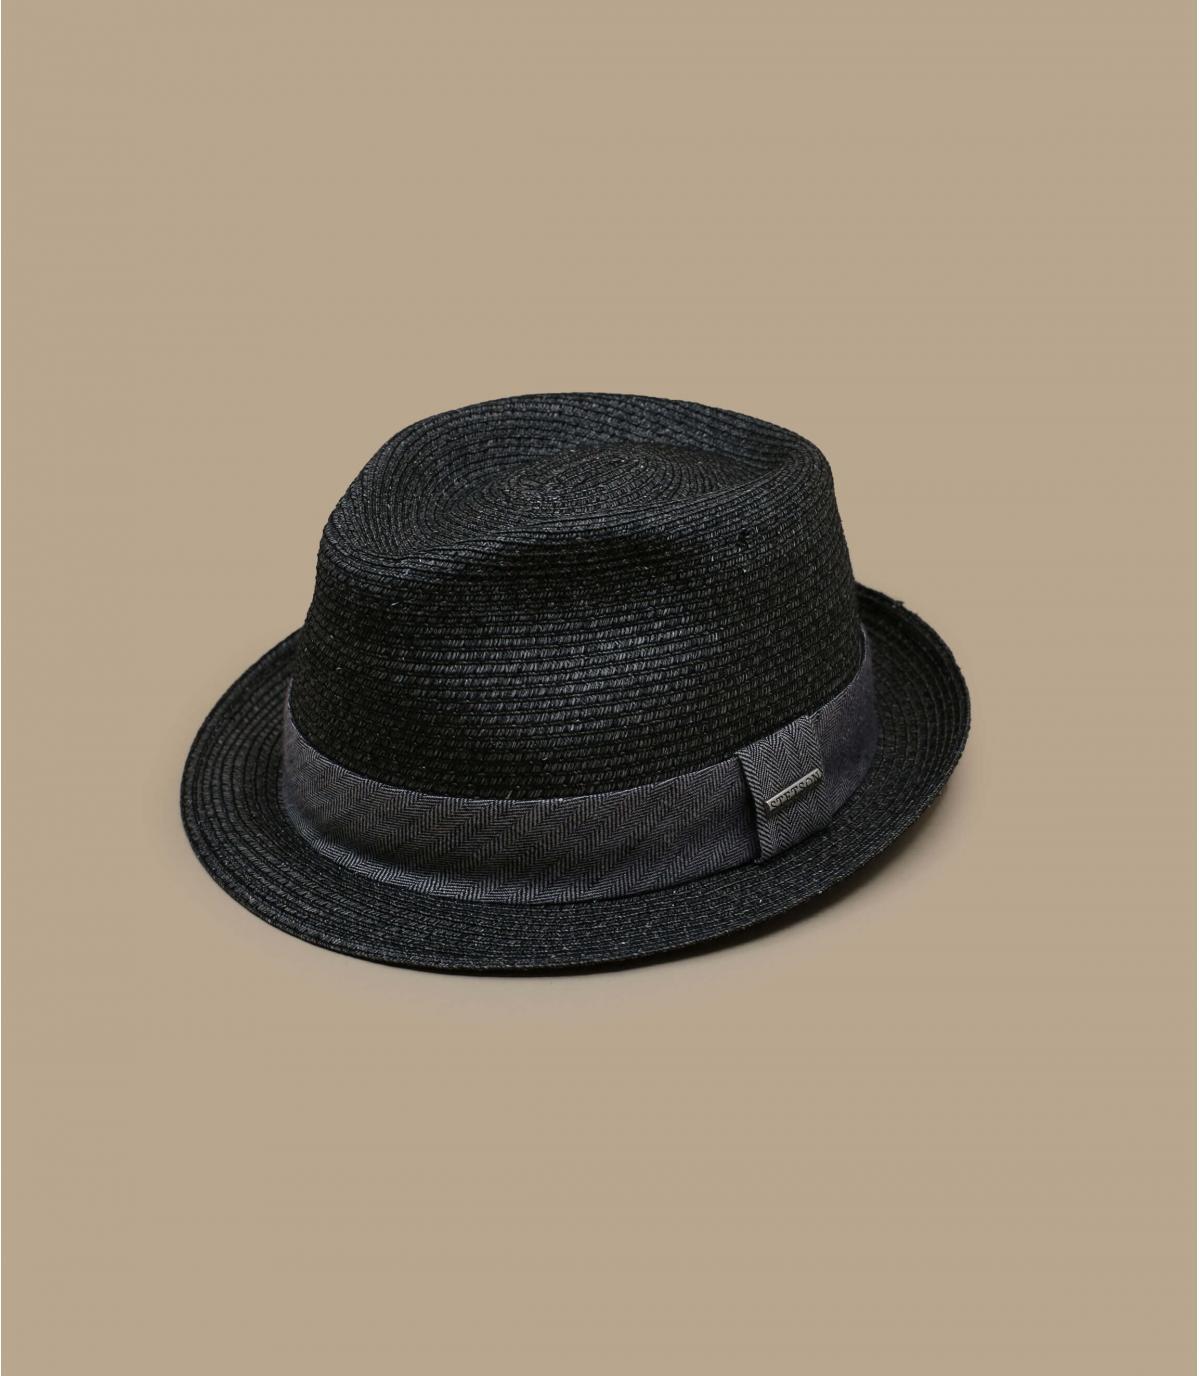 d60ef48004c Buy straw hat - Online hat shop